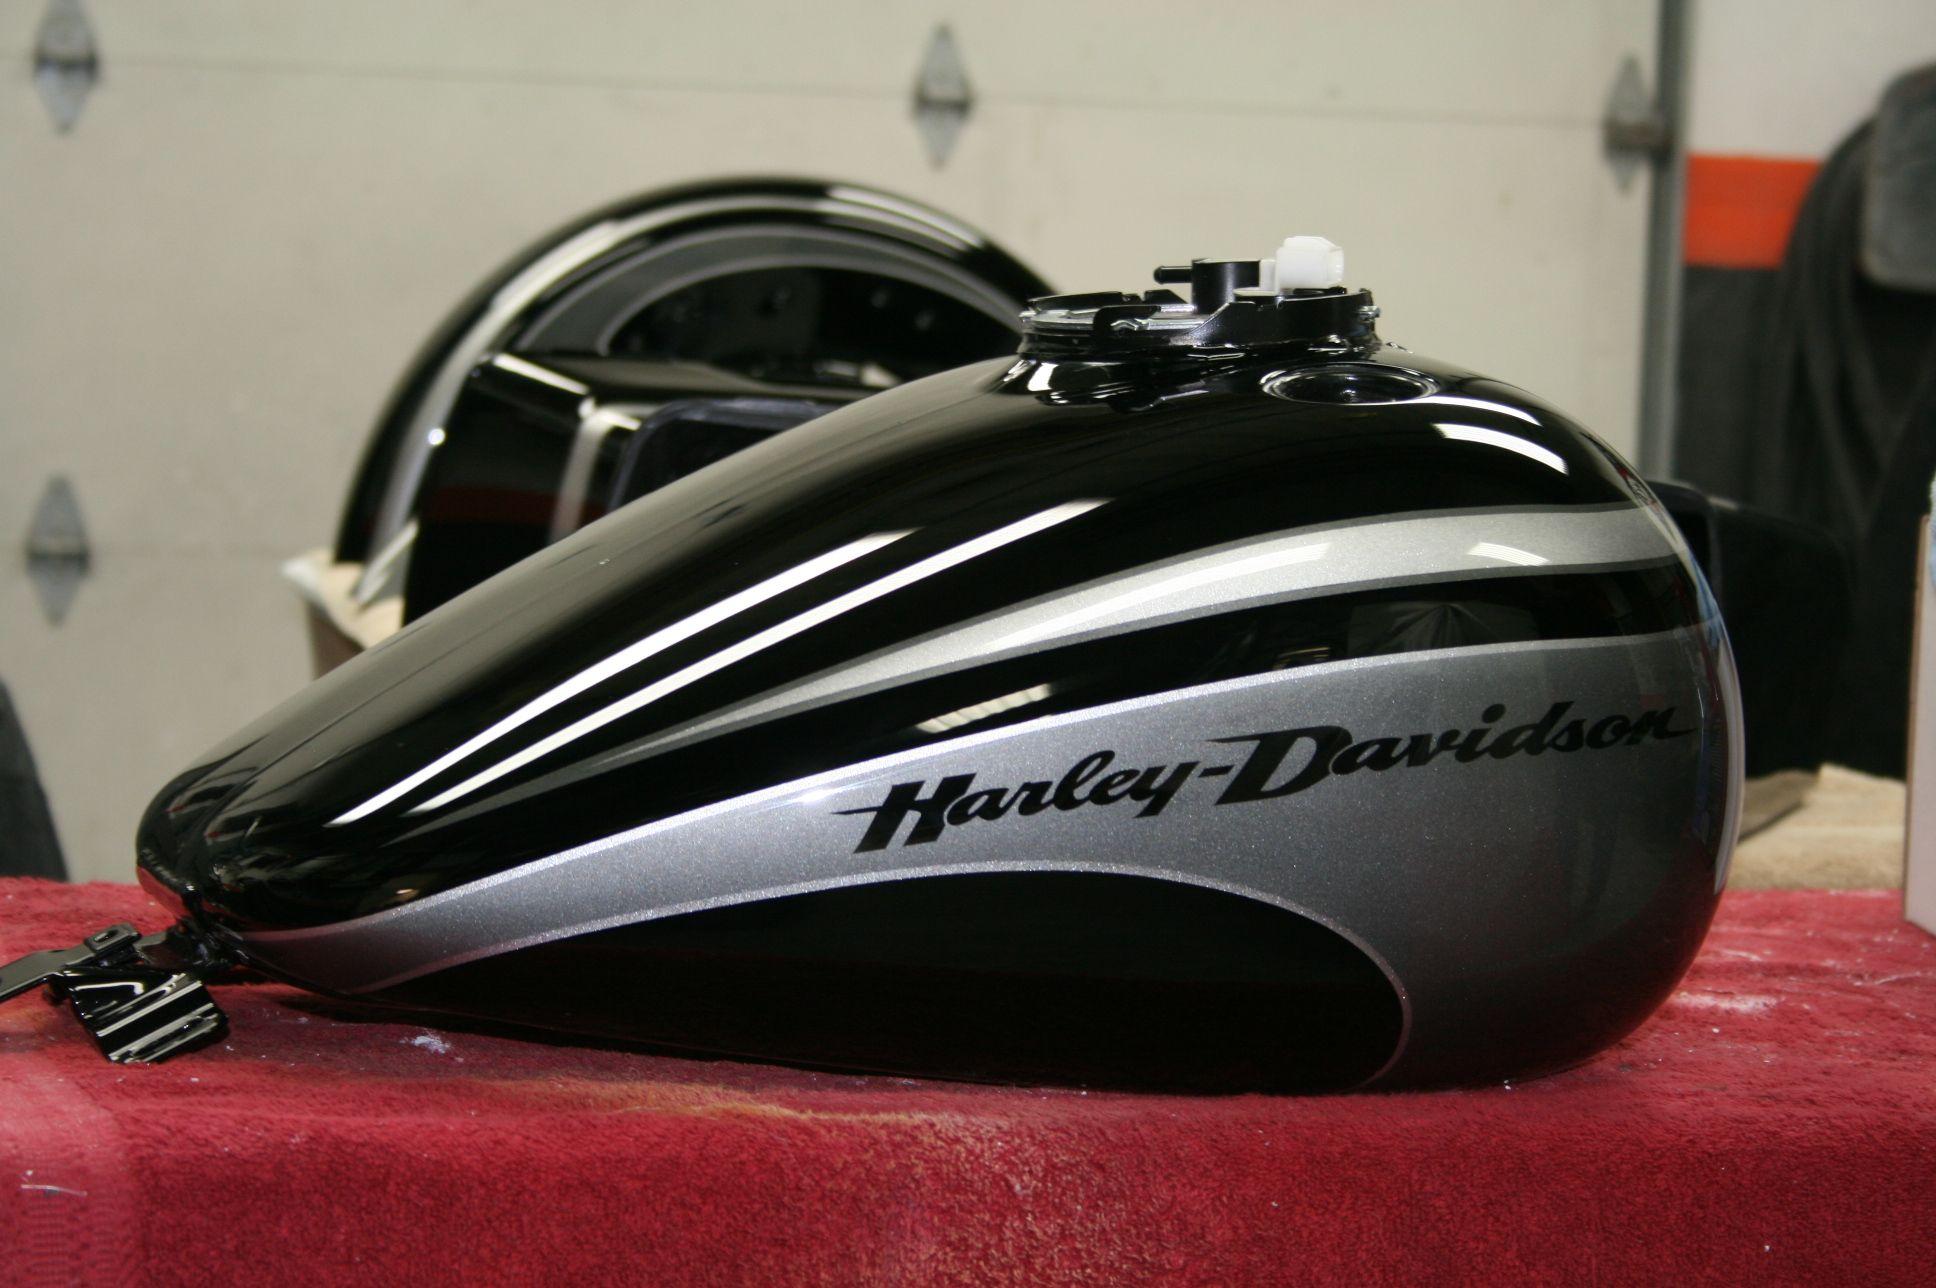 Custom Harley Paint Jobs | Home PAIRADICE CYCLES PAINT HARLEY BAGGER WHEELS ENGINE MODS AIR RIDE ...